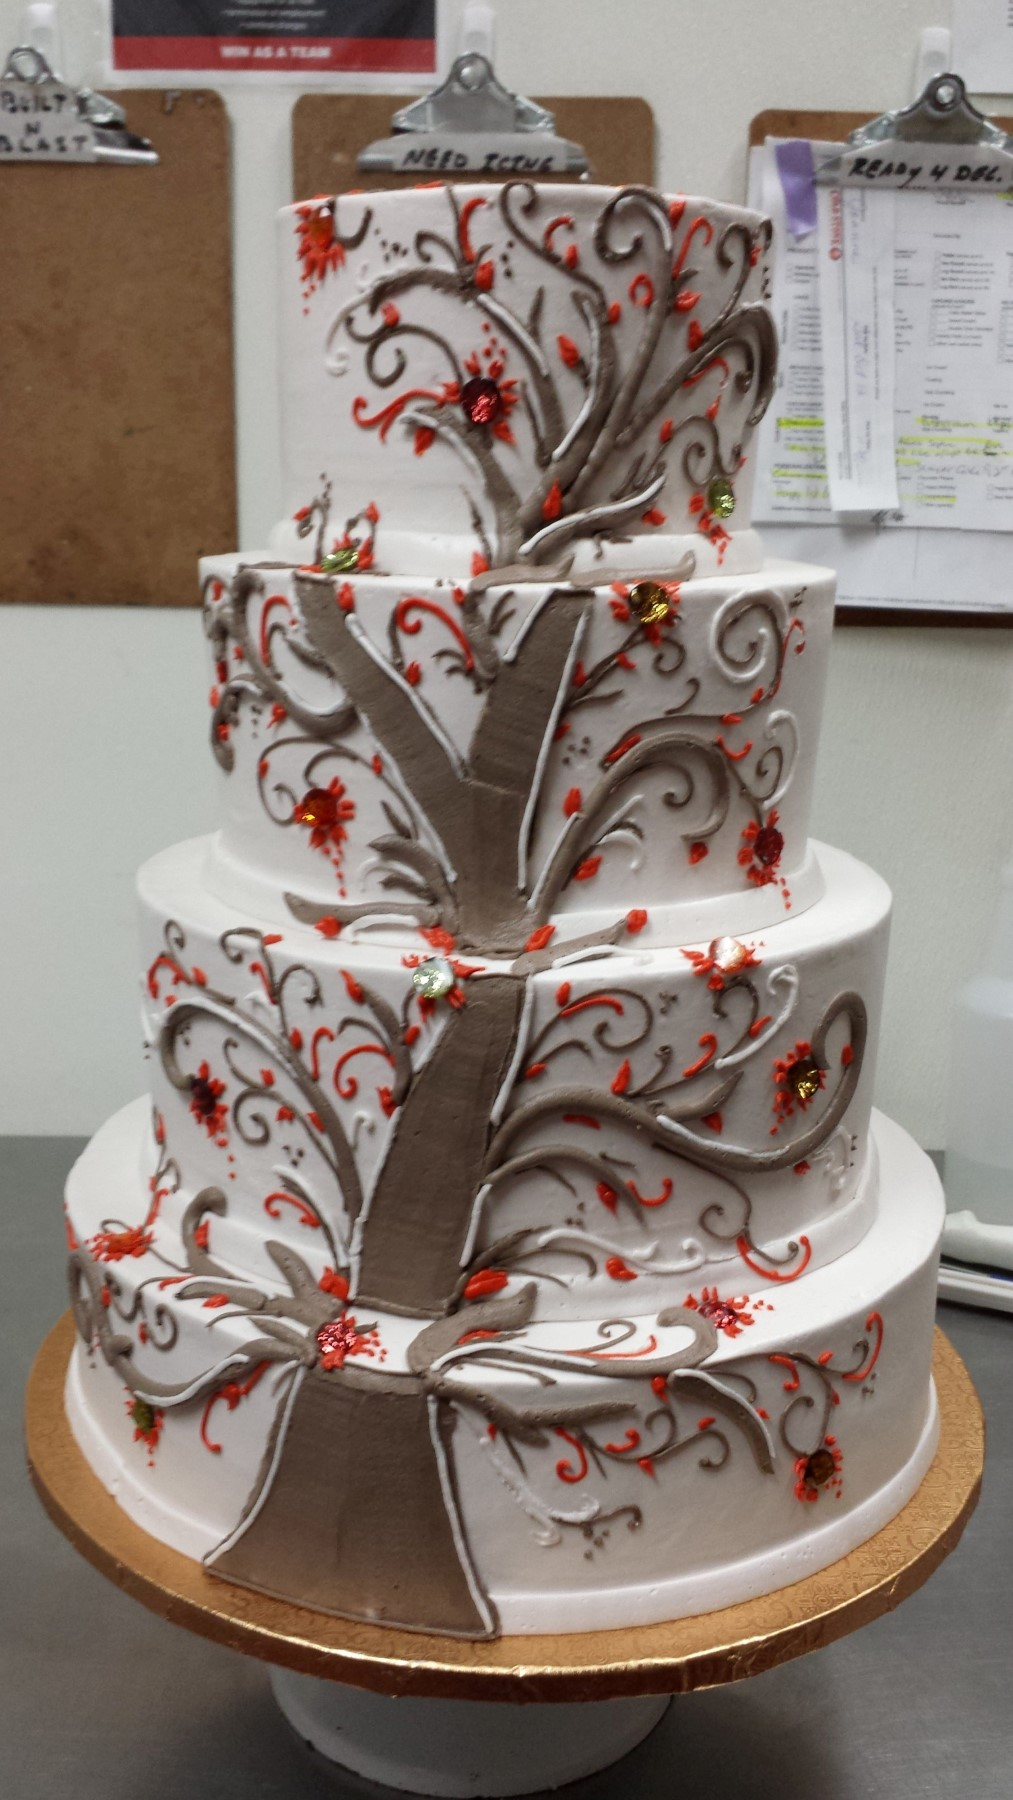 Wedding Cakes Custom Cake Decorations Donuts Pastries